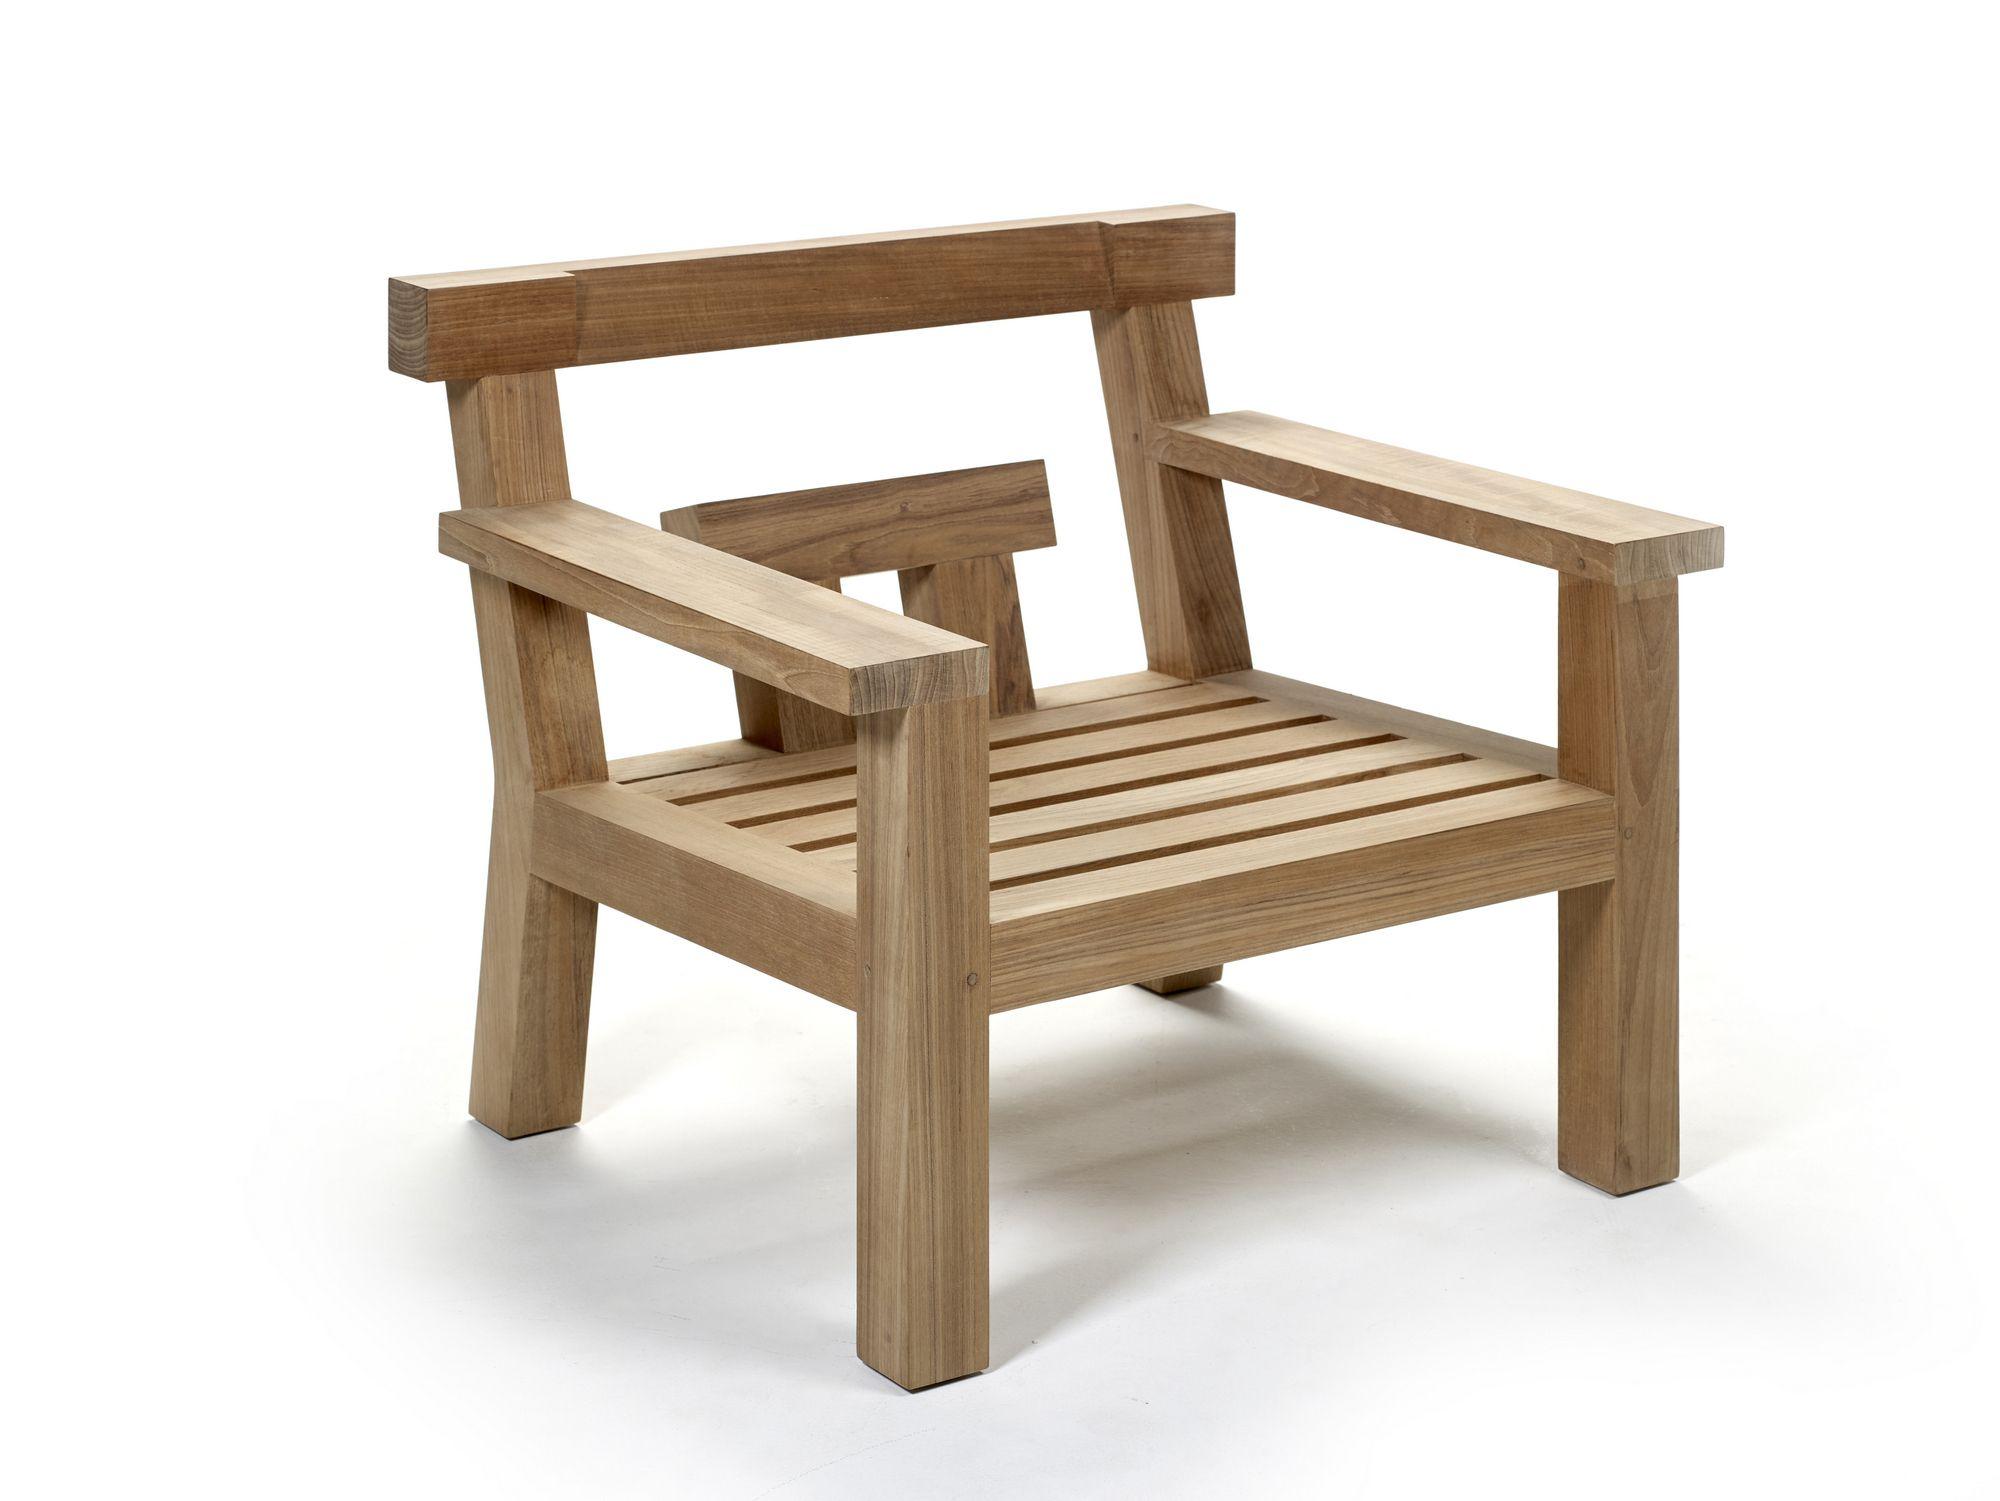 Teak Garden Armchair With Armrests Nara Easy Chair Royal Botania Royal Botania Chair Easy Chair